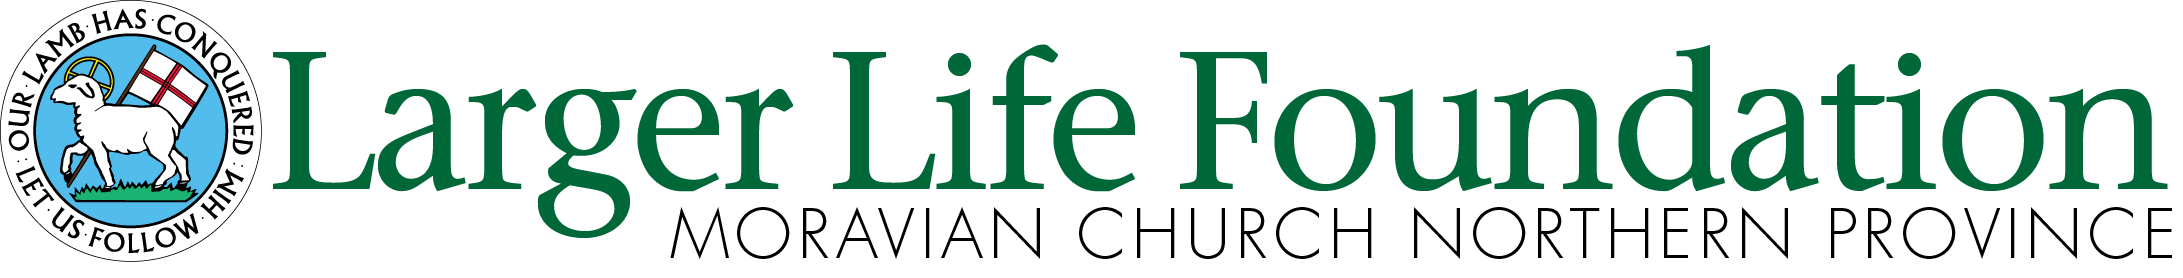 Moravian Larger Life Foundation